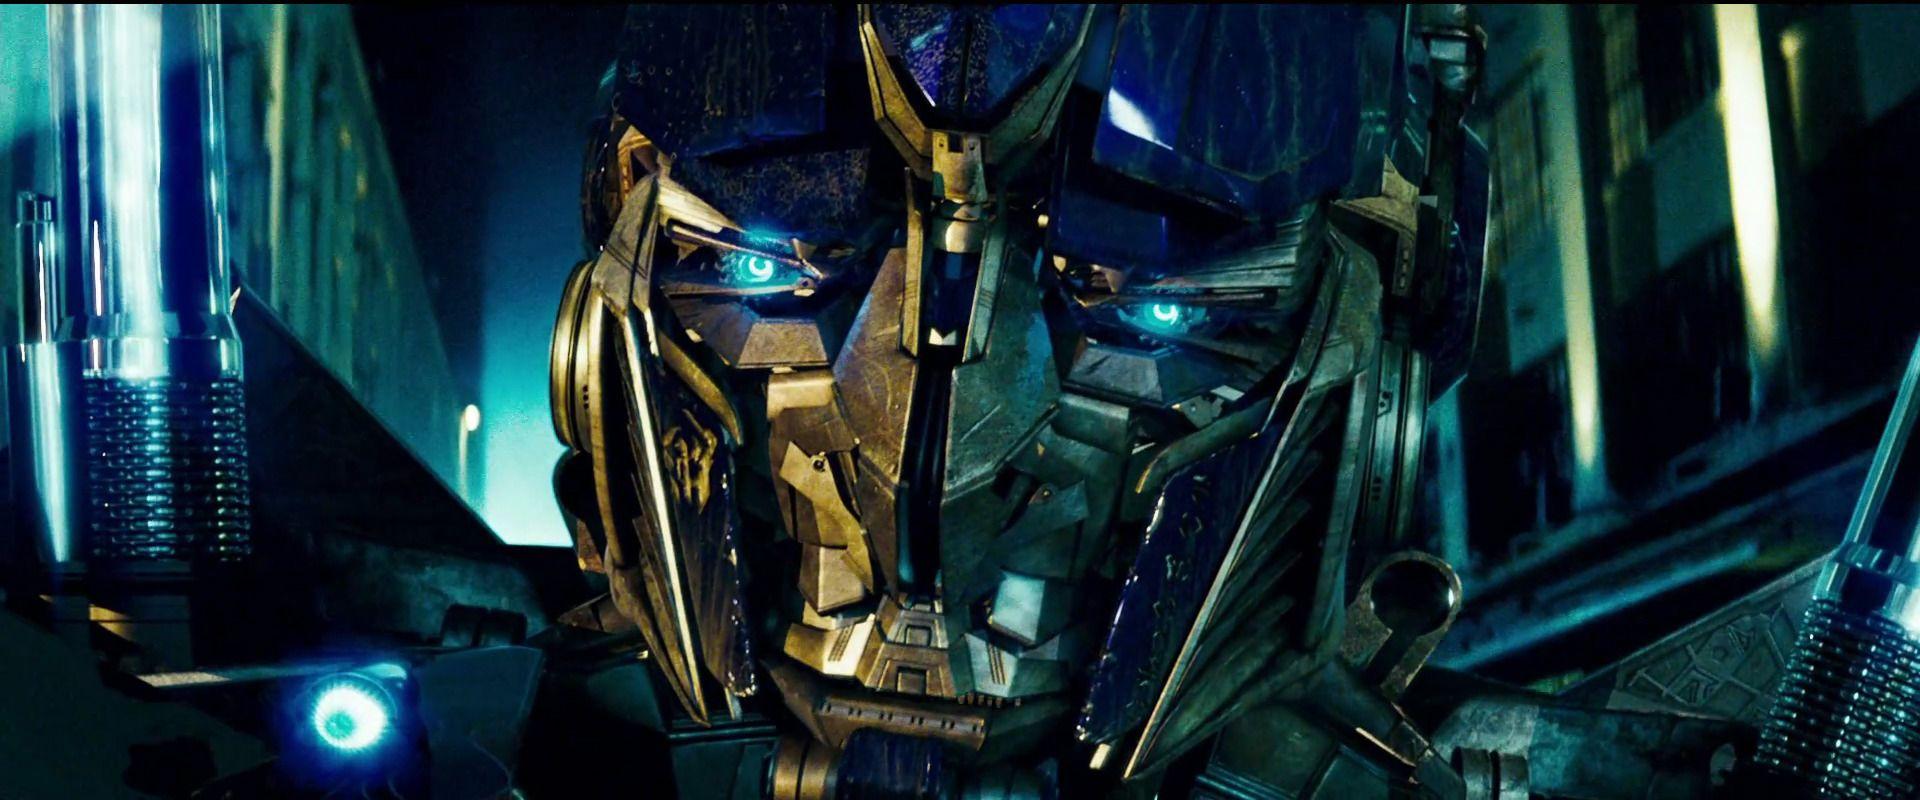 Transformers 2007 Transformers Transformers Optimus Transformers Optimus Prime